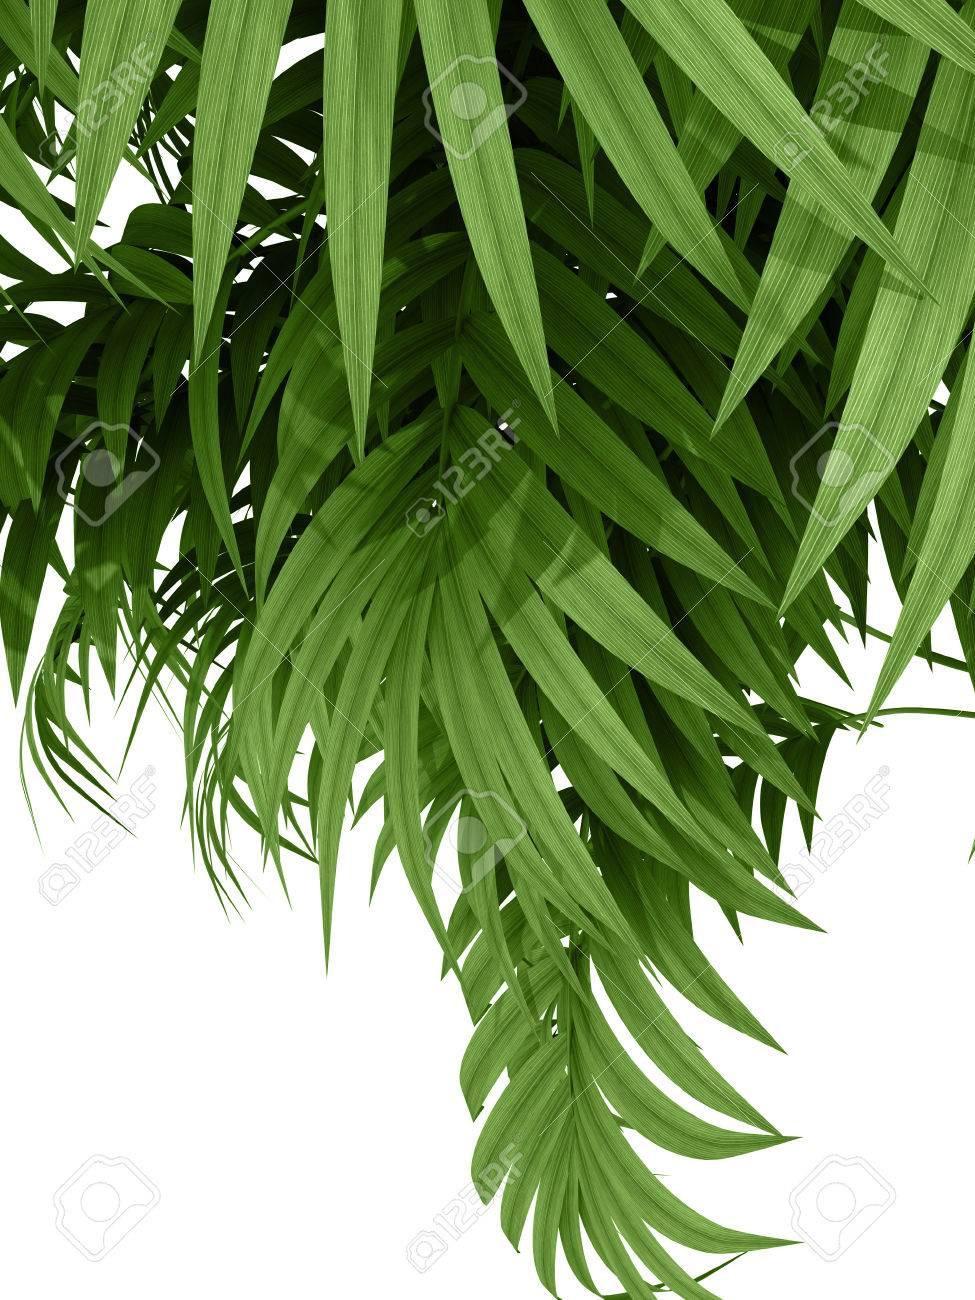 Siepe Di Bambu.Tropicali Pianta Fernleaf Rami Siepe Di Bambu Su Sfondo Bianco